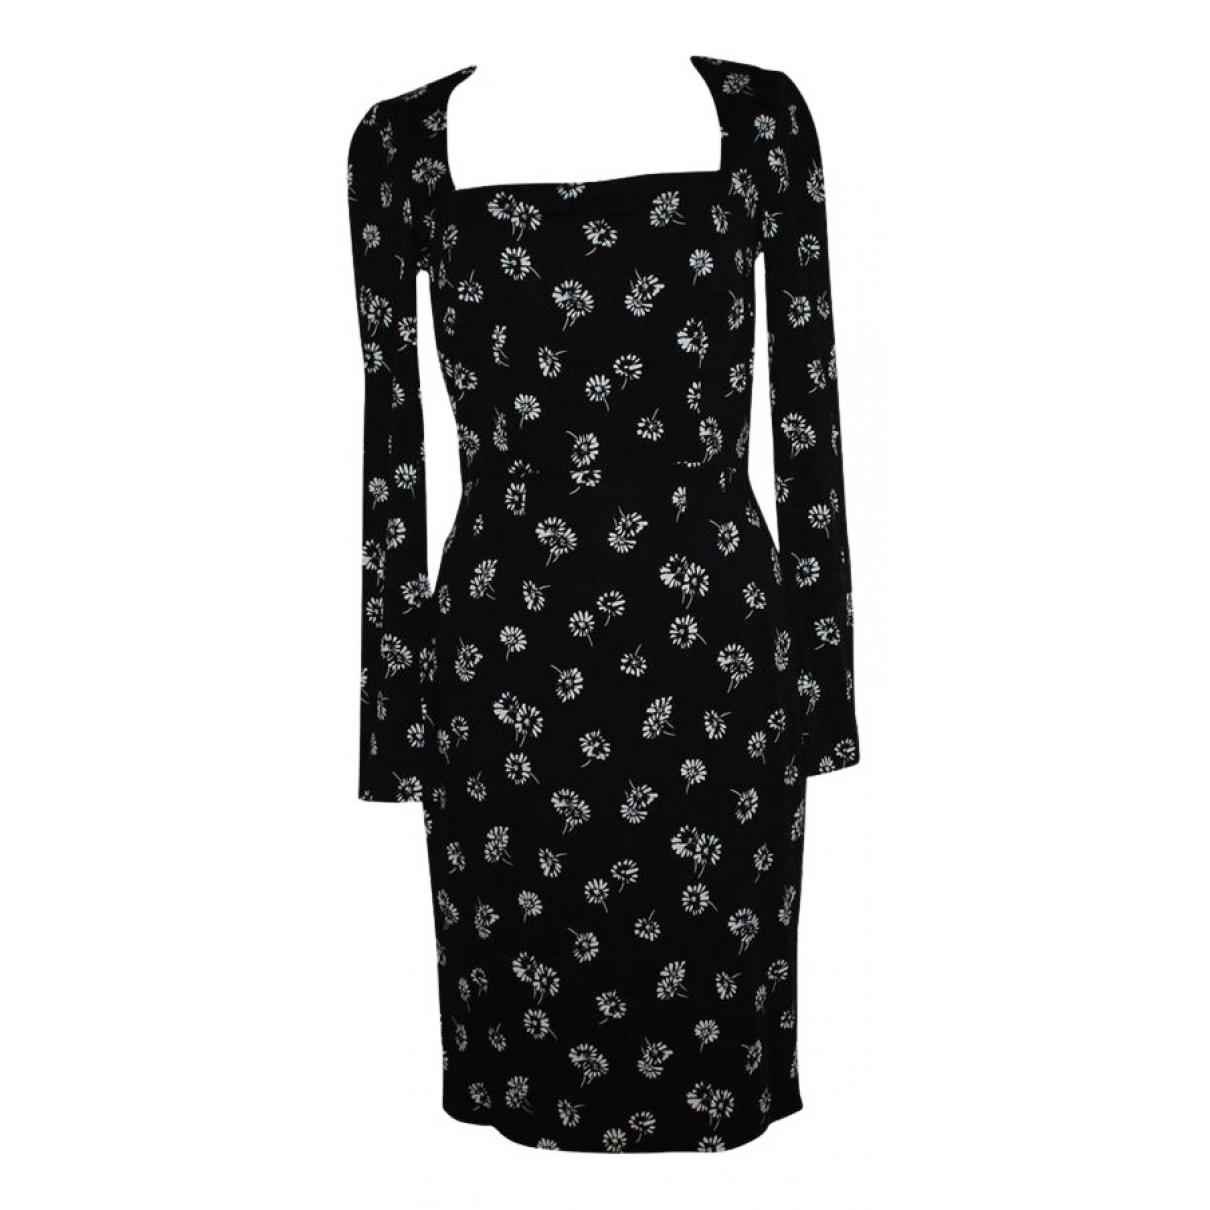 Dolce & Gabbana N Black dress for Women S International